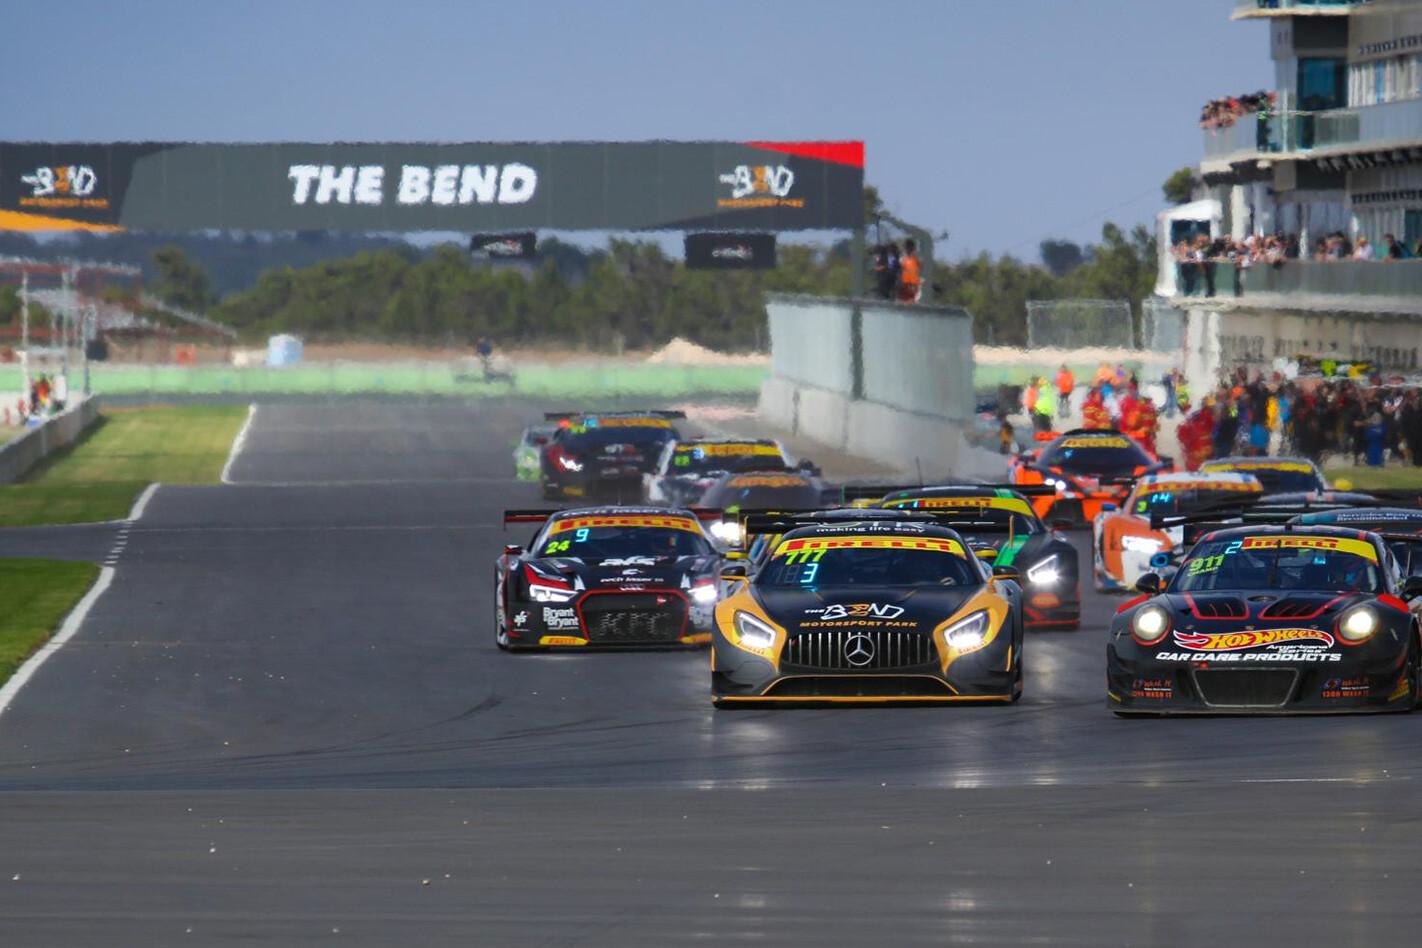 The Bend Racing Jpg